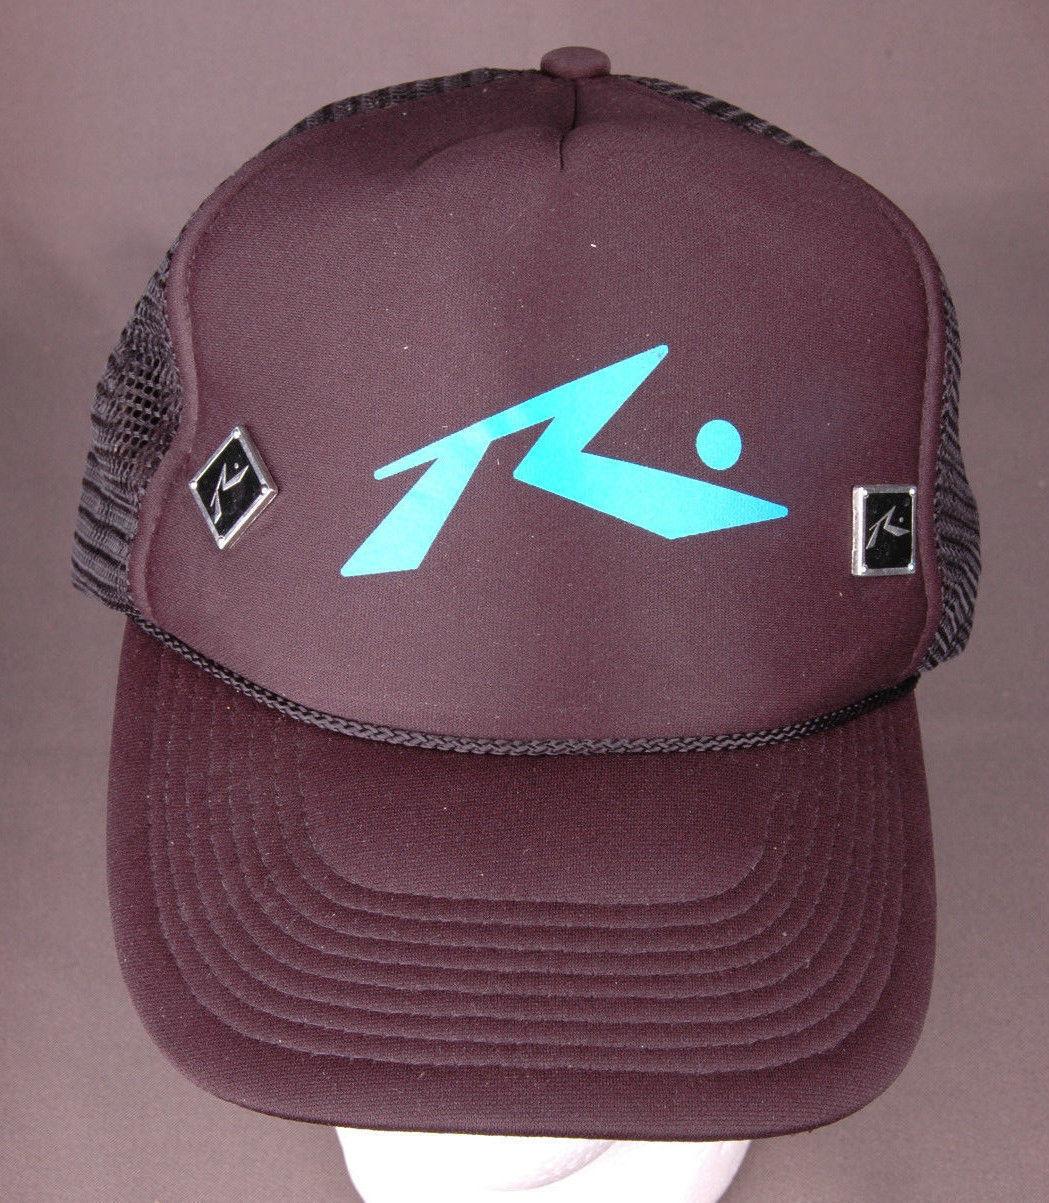 2dd23b578ebec RUSTY Trucker Hat-Black-Mesh-Snap and 19 similar items. 57